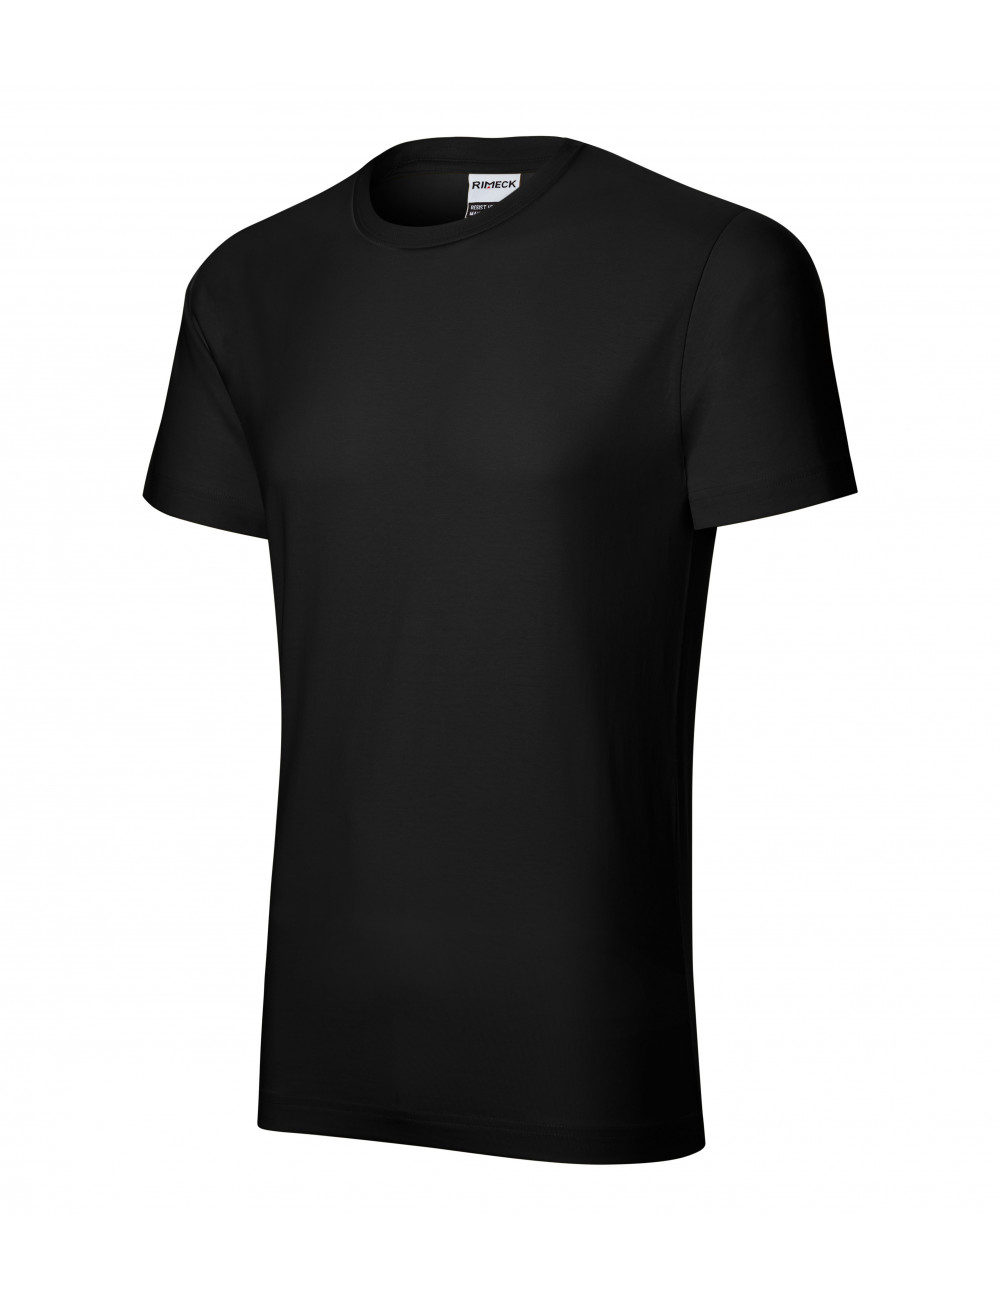 Adler RIMECK Koszulka męska Resist heavy R03 czarny